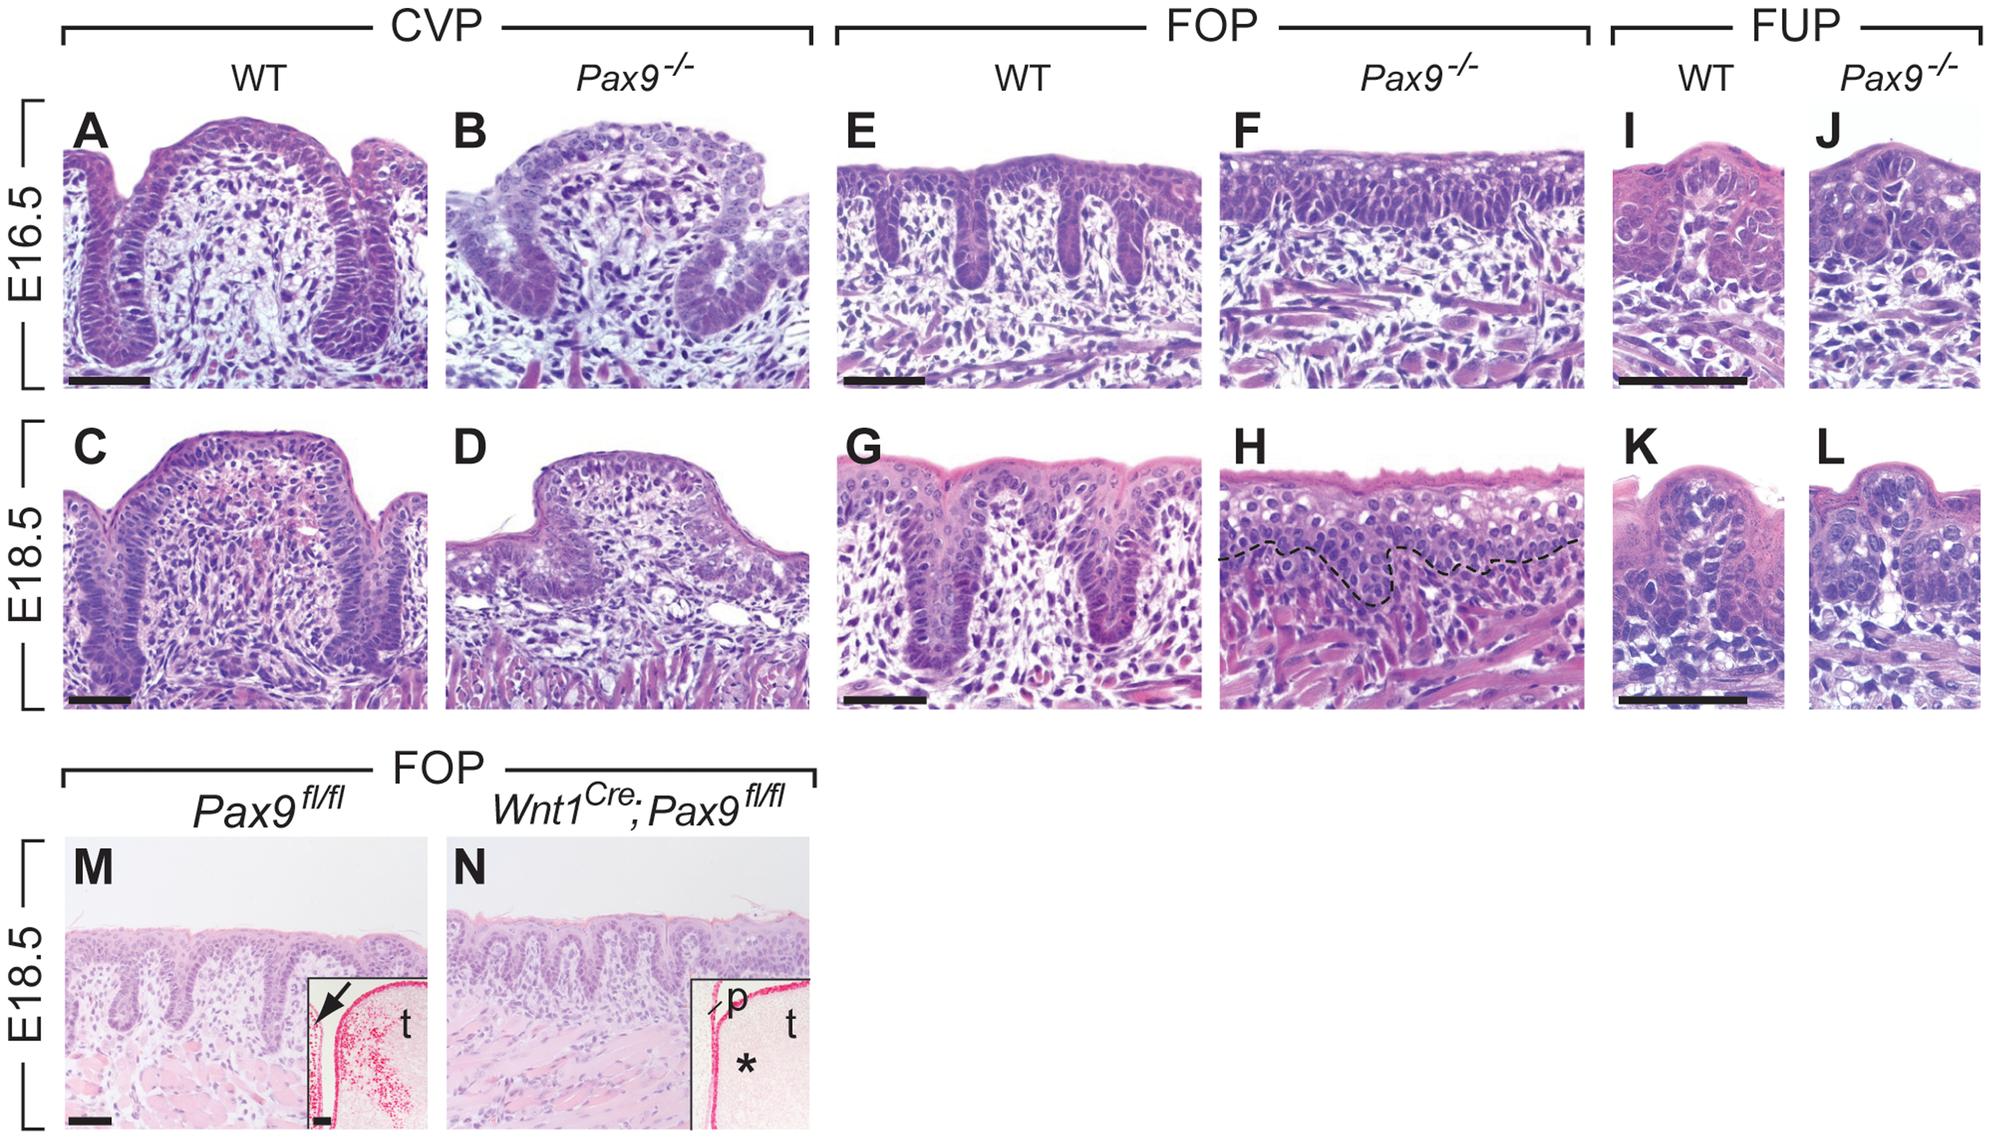 Arrest of CVP and FOP development in <i>Pax9</i>-deficient mouse embryos.